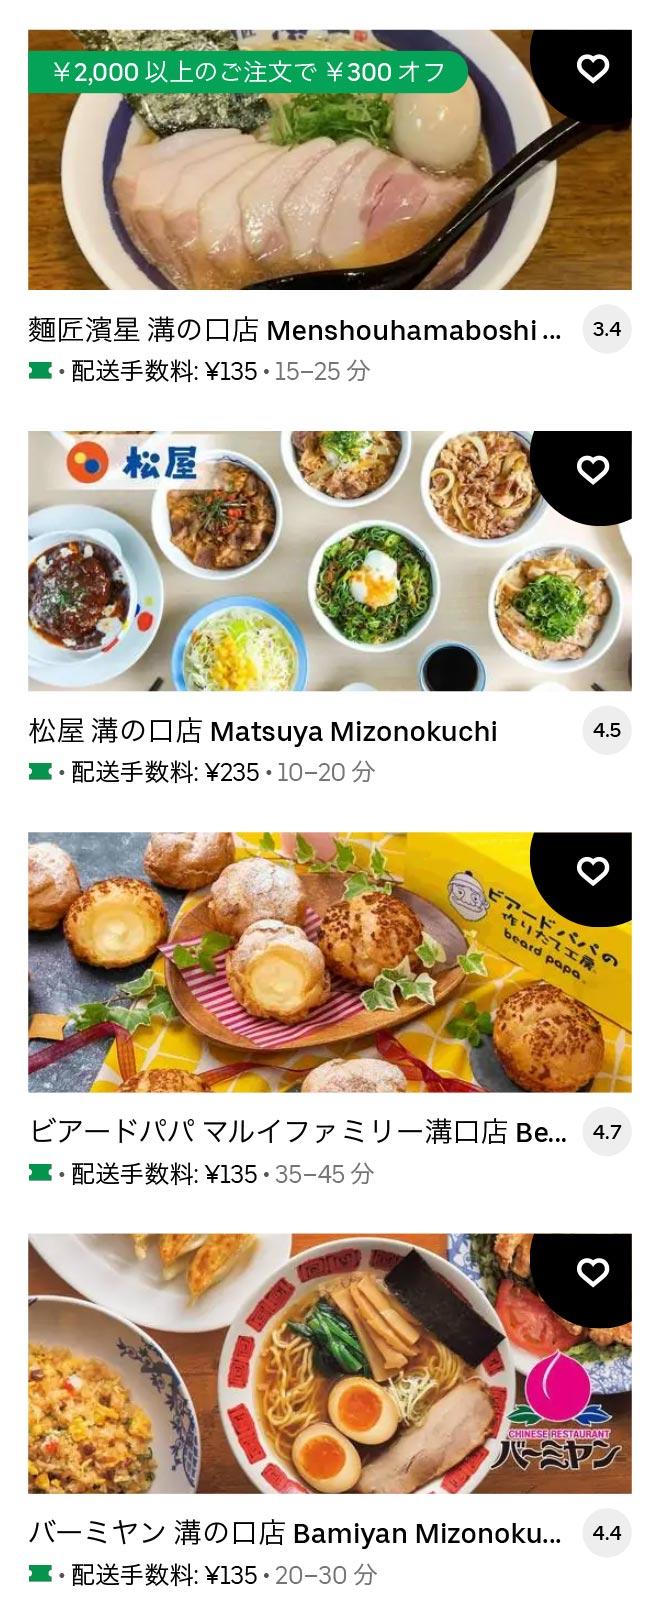 1 u mizonokuchi 2105 10